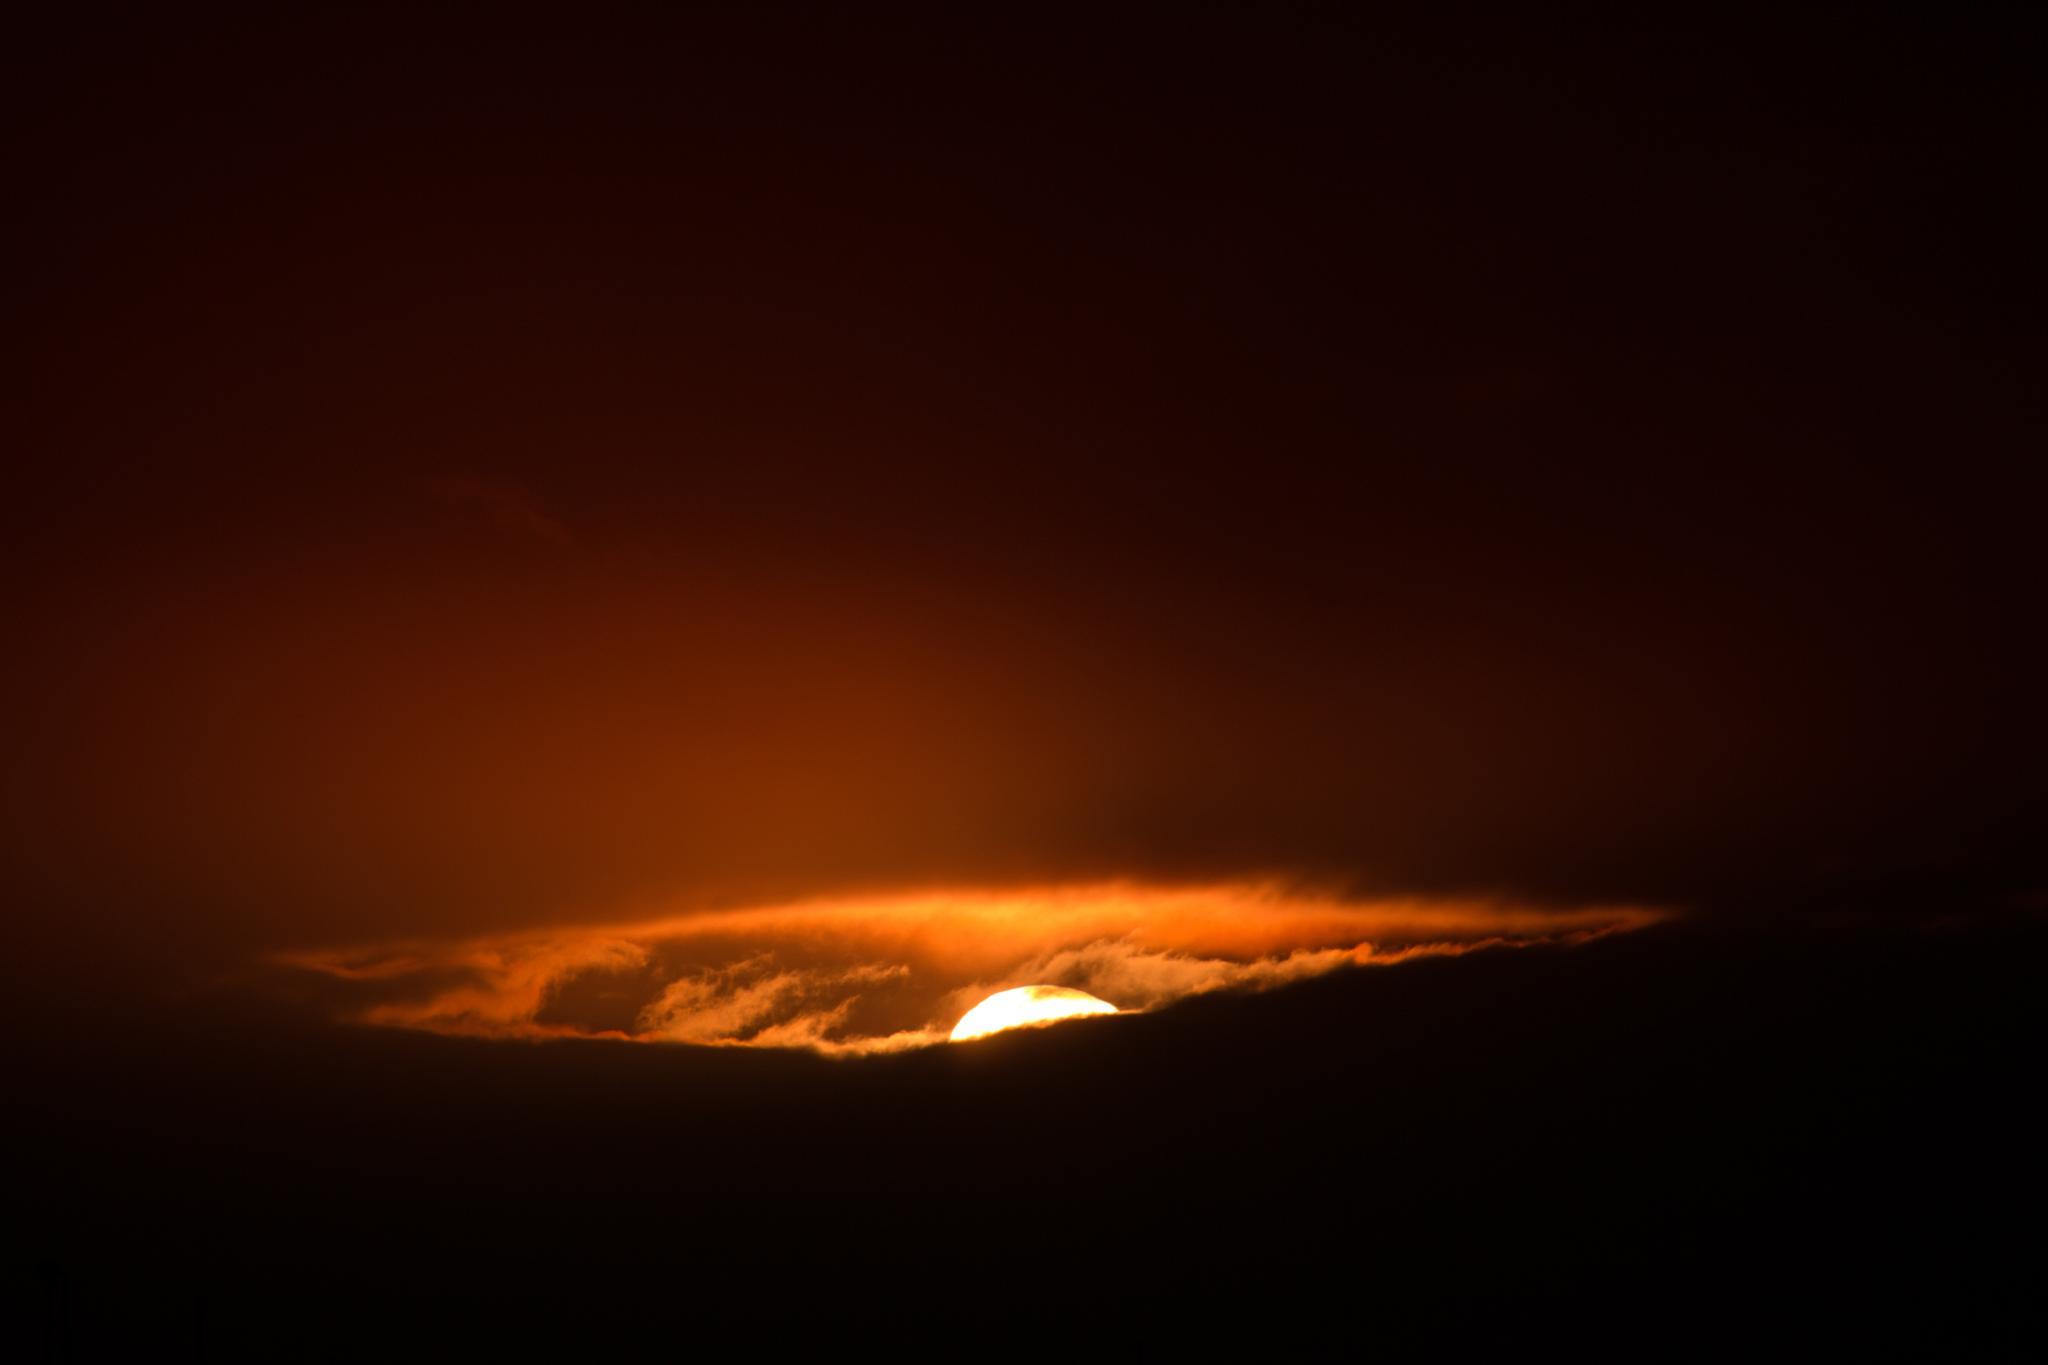 The Eye of the Sun by Daniel Boavida